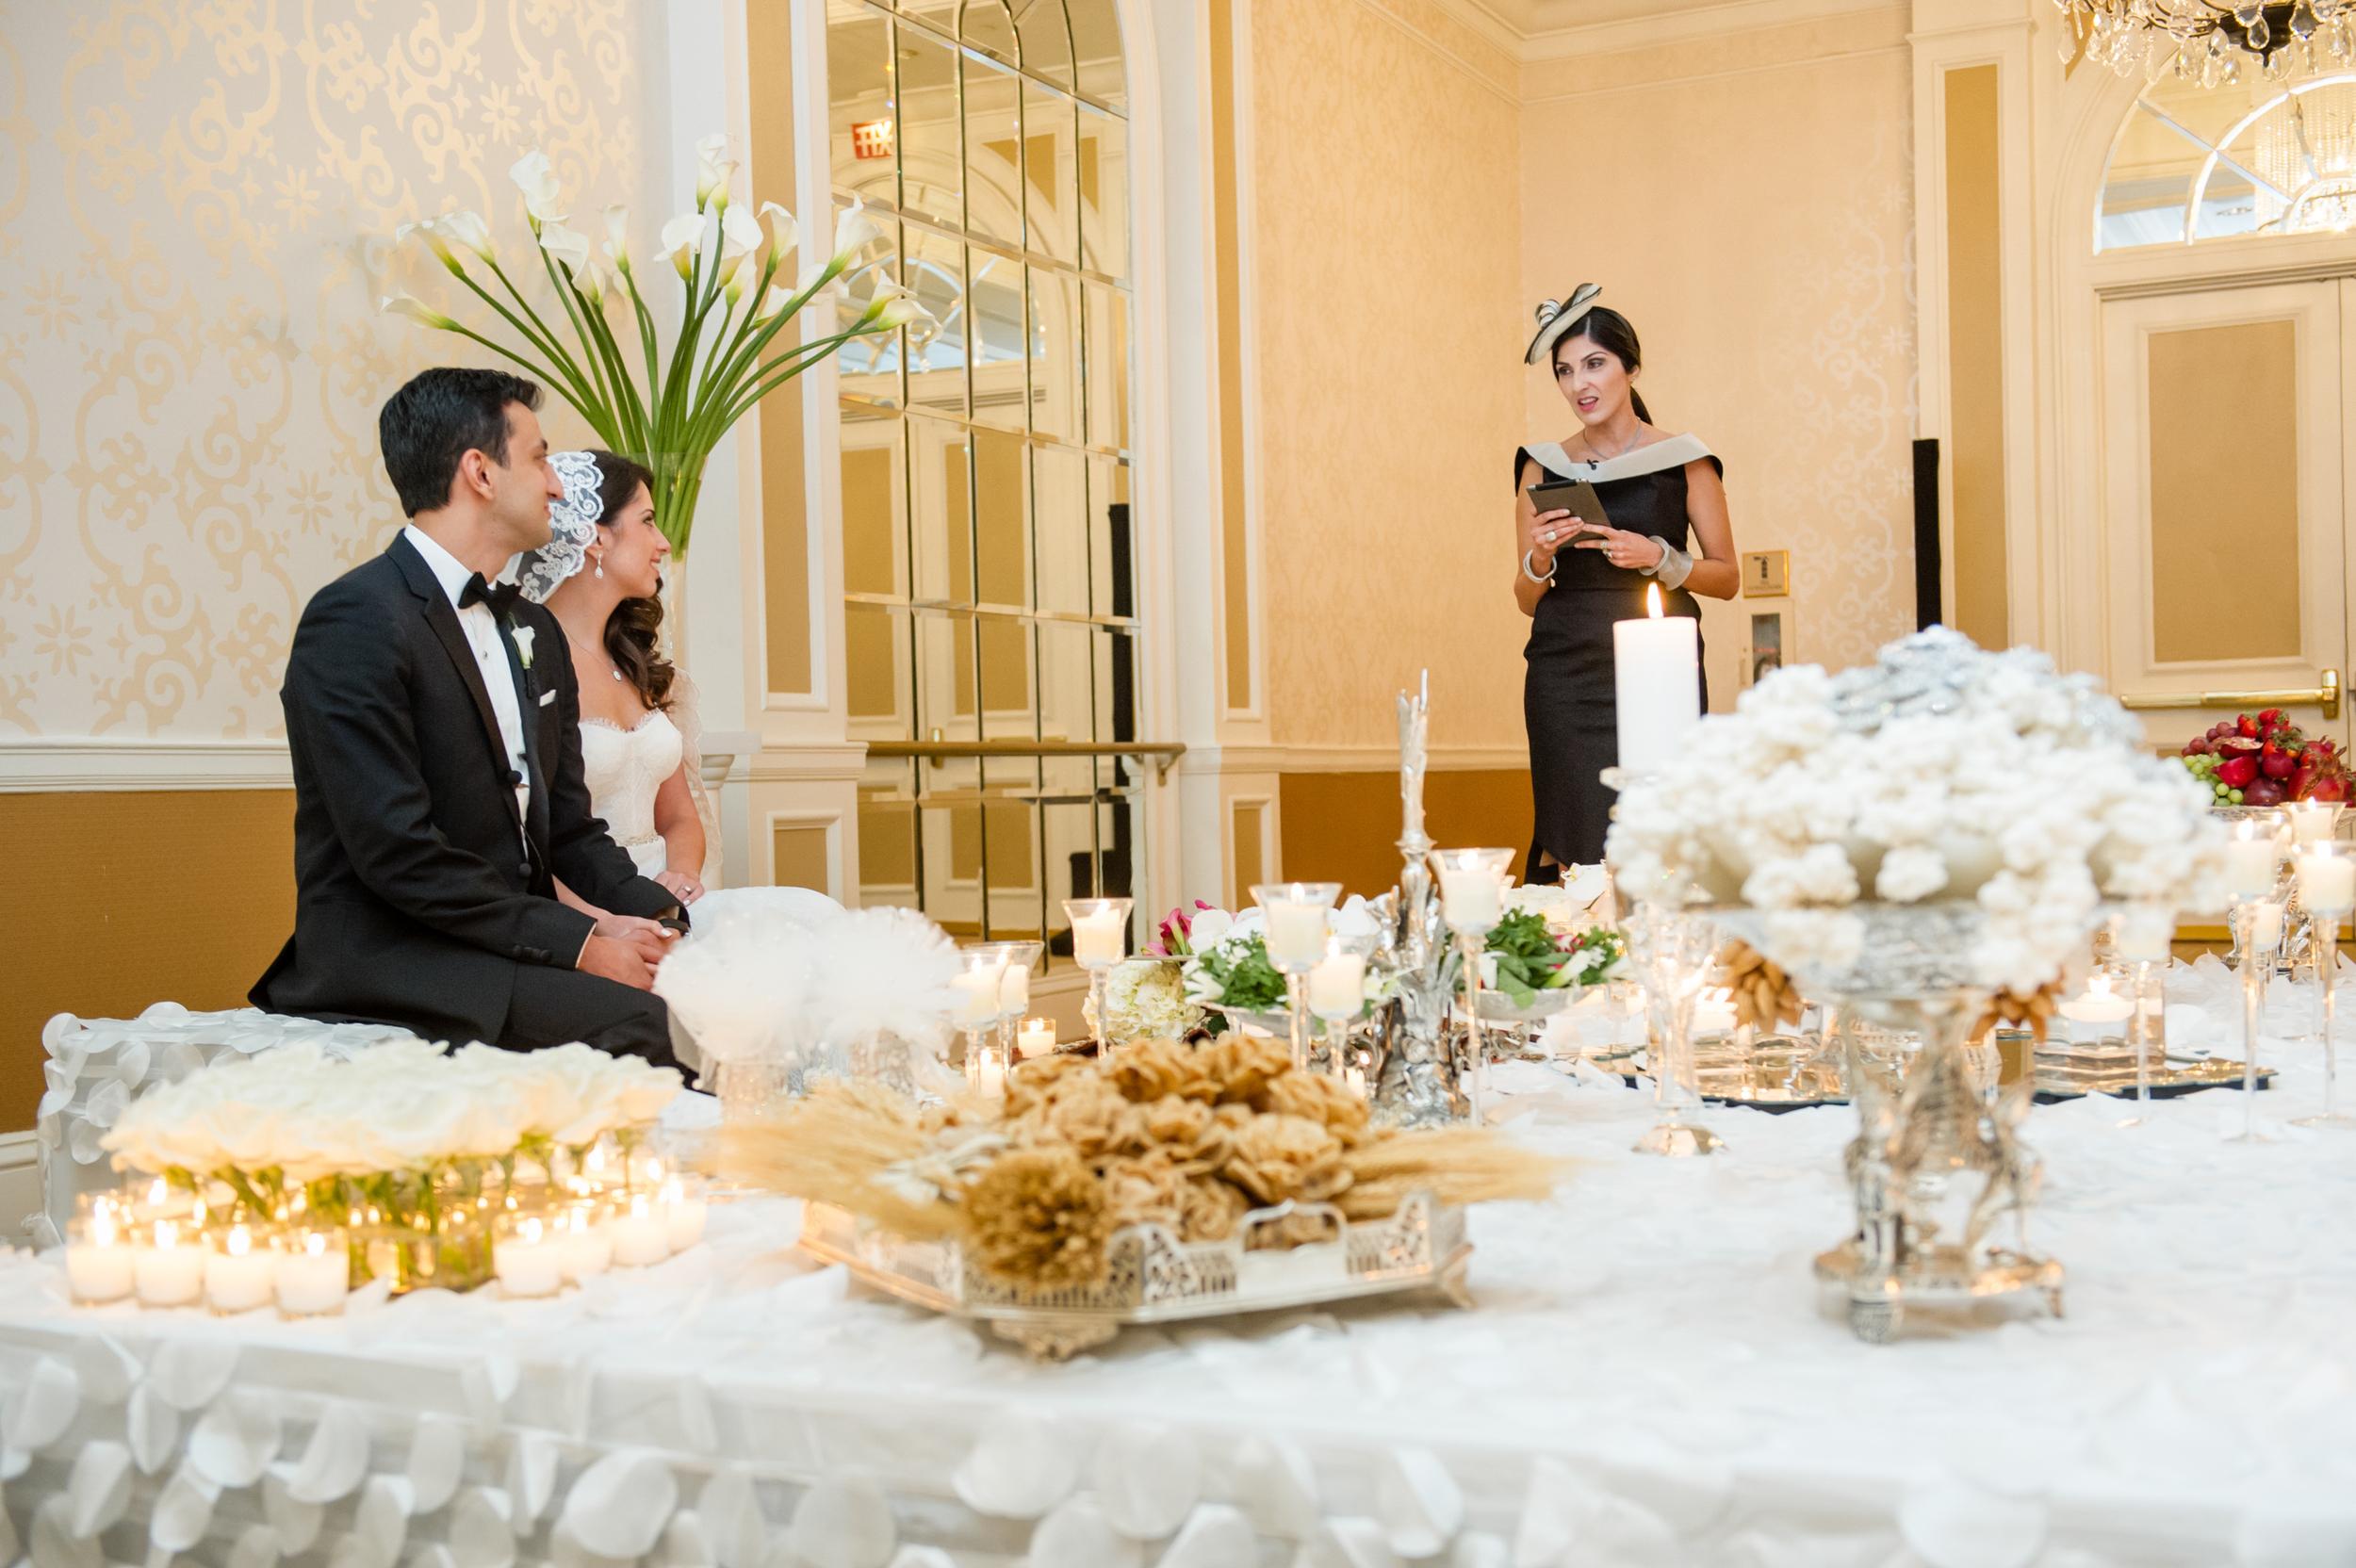 20140906_beeta_ali_wedding_0546.jpg